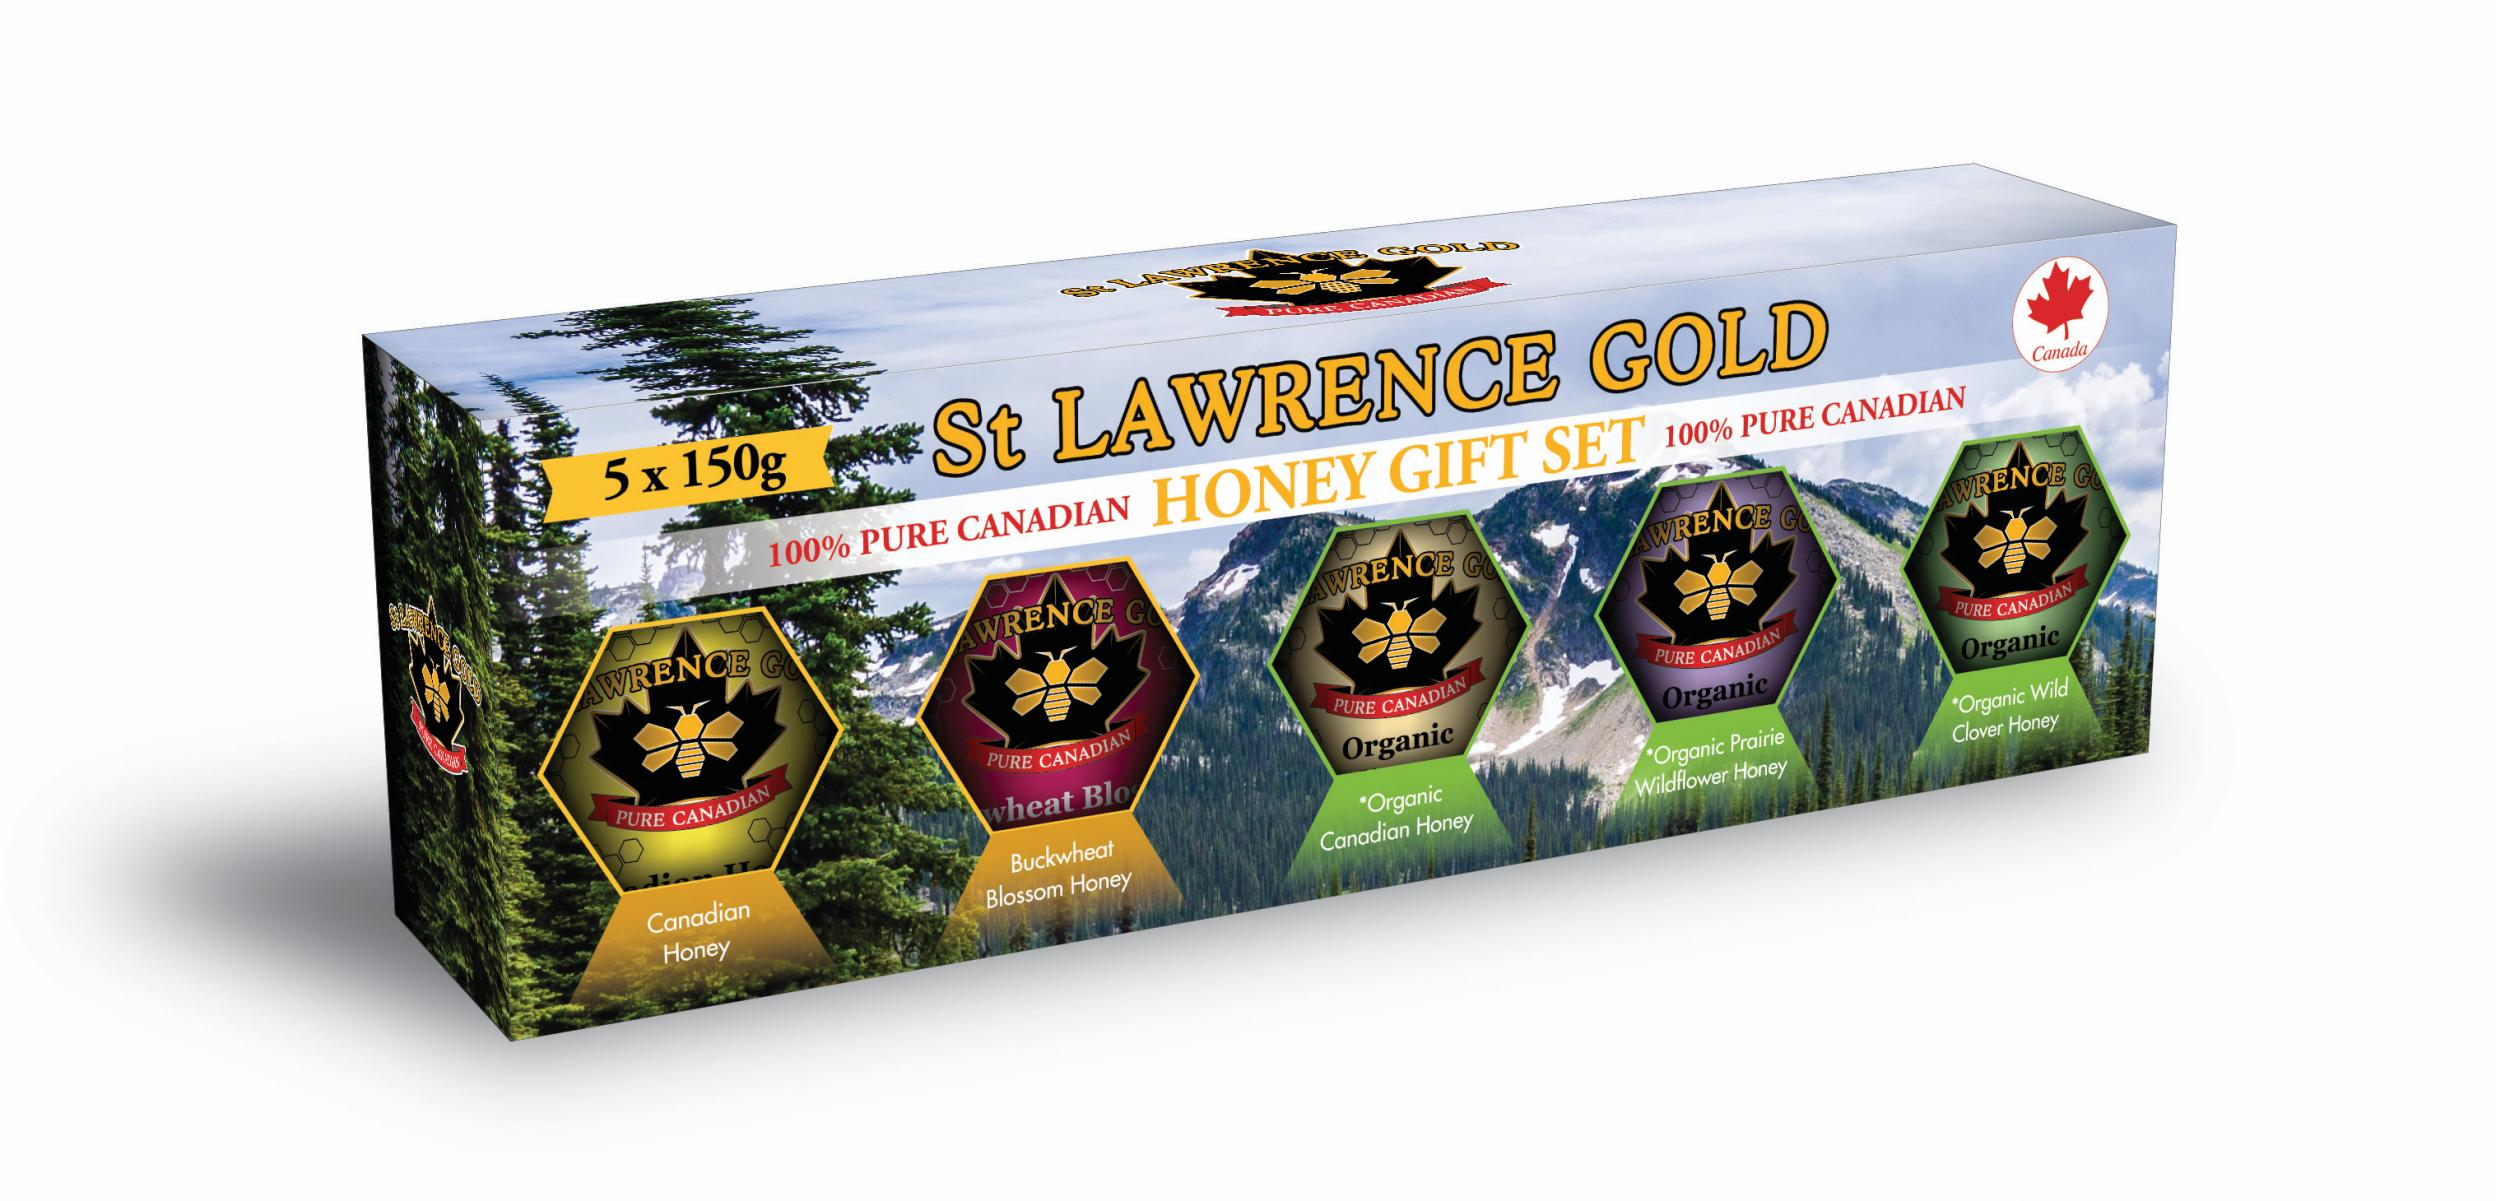 Pure Canadian Honey Gift Box (5 x 150g)